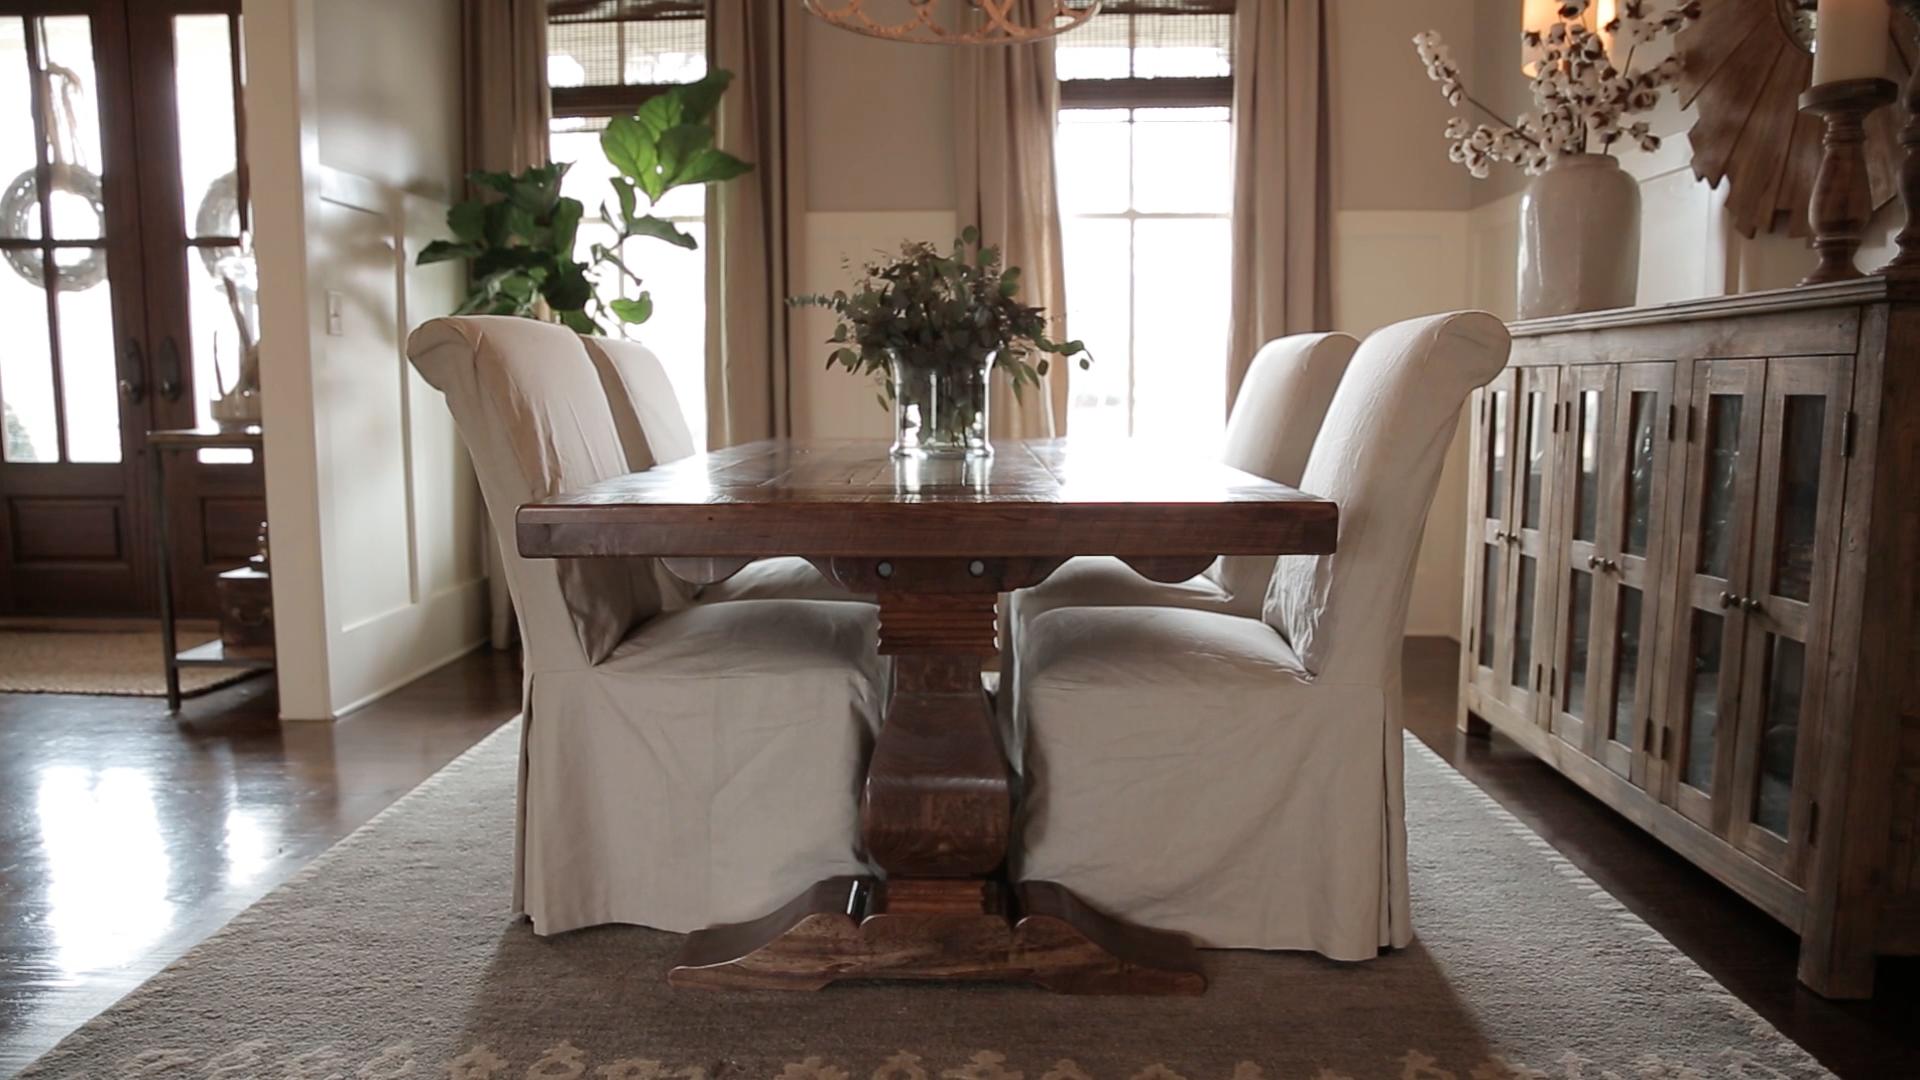 Rustic Trades Furniture | Rustic Distressed Reclaimed Dining Kitchen Farm Tables  Atlanta Denver Colorado | Custom